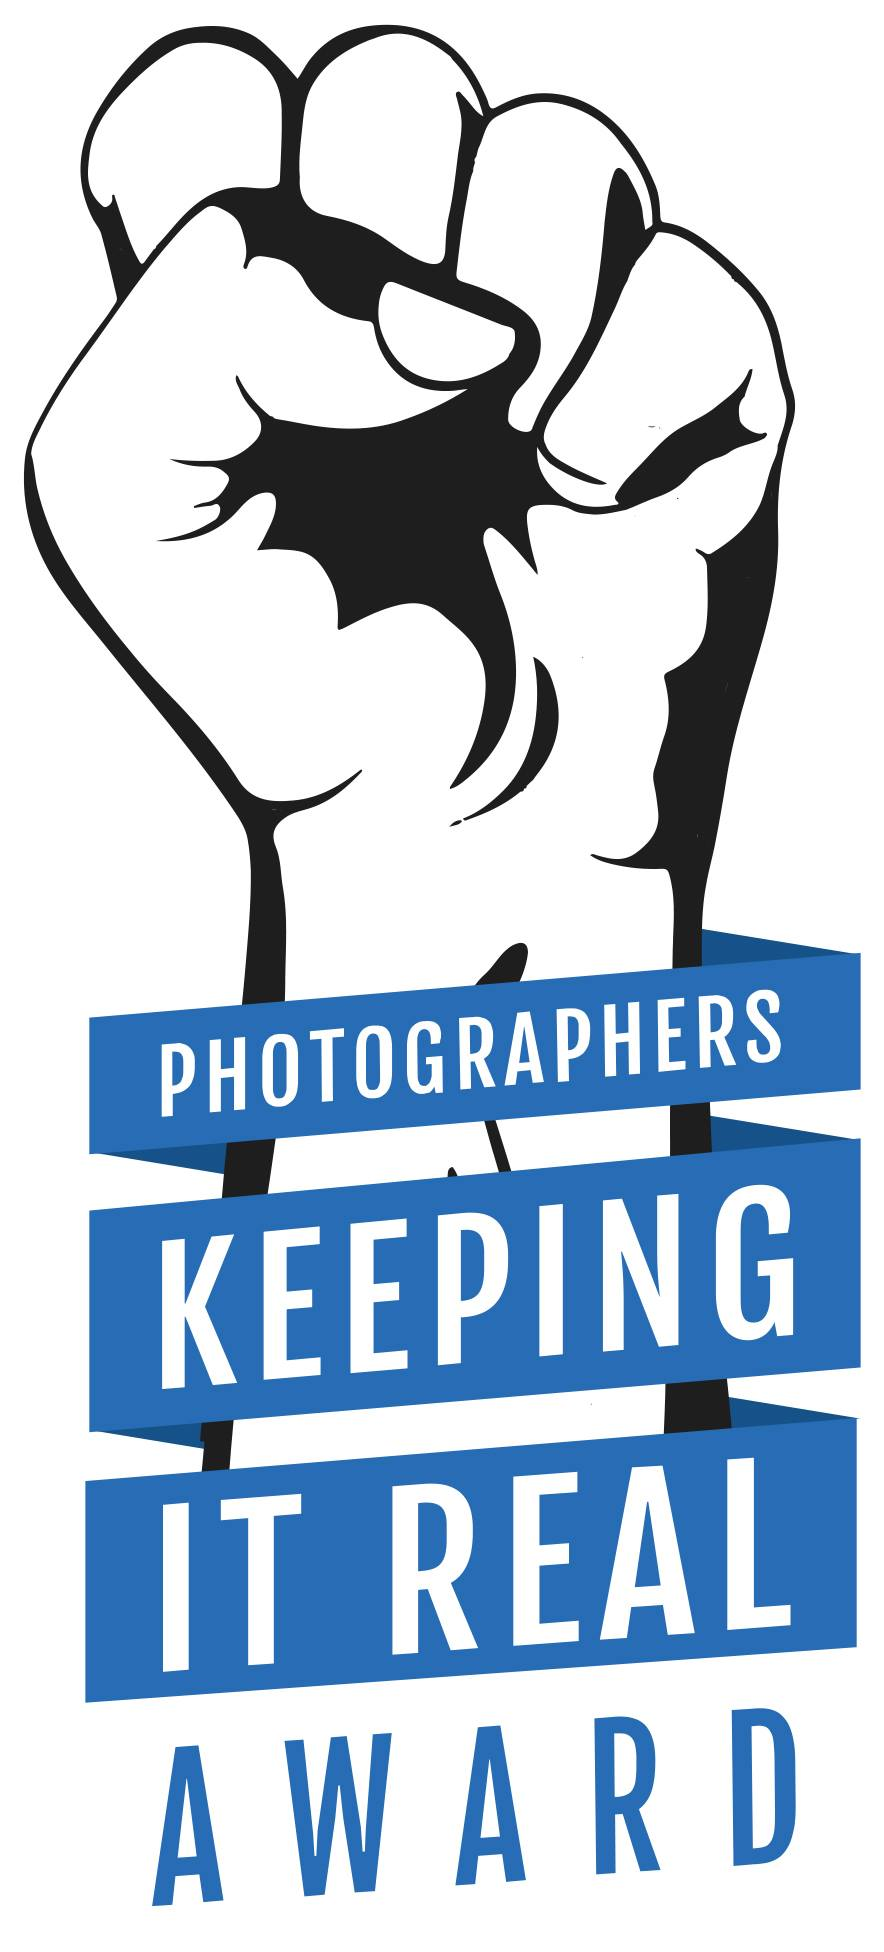 Photographer keeping it real award badge